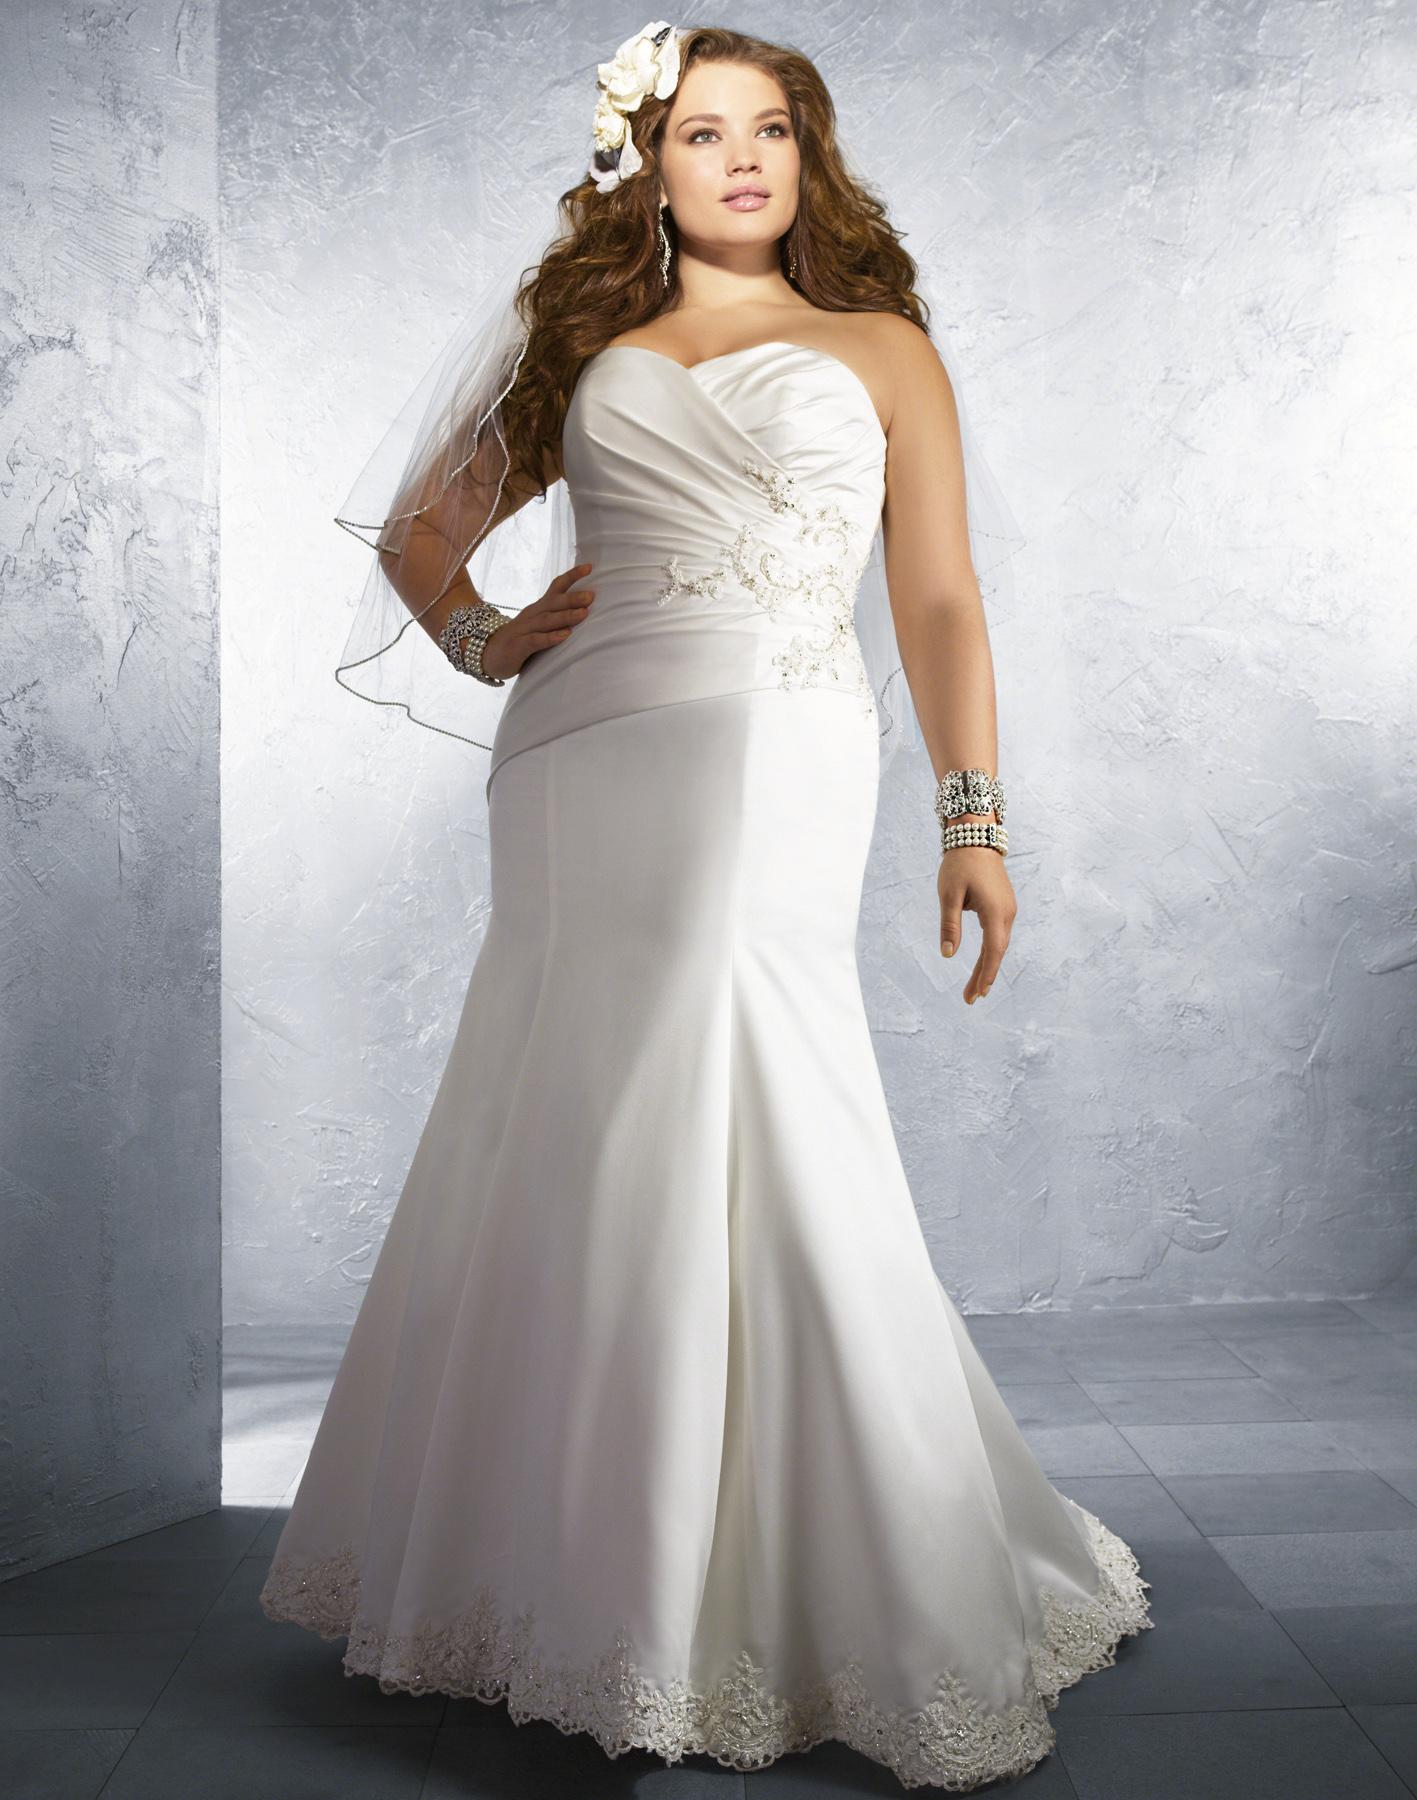 Tara Lynn Wedding Dresses